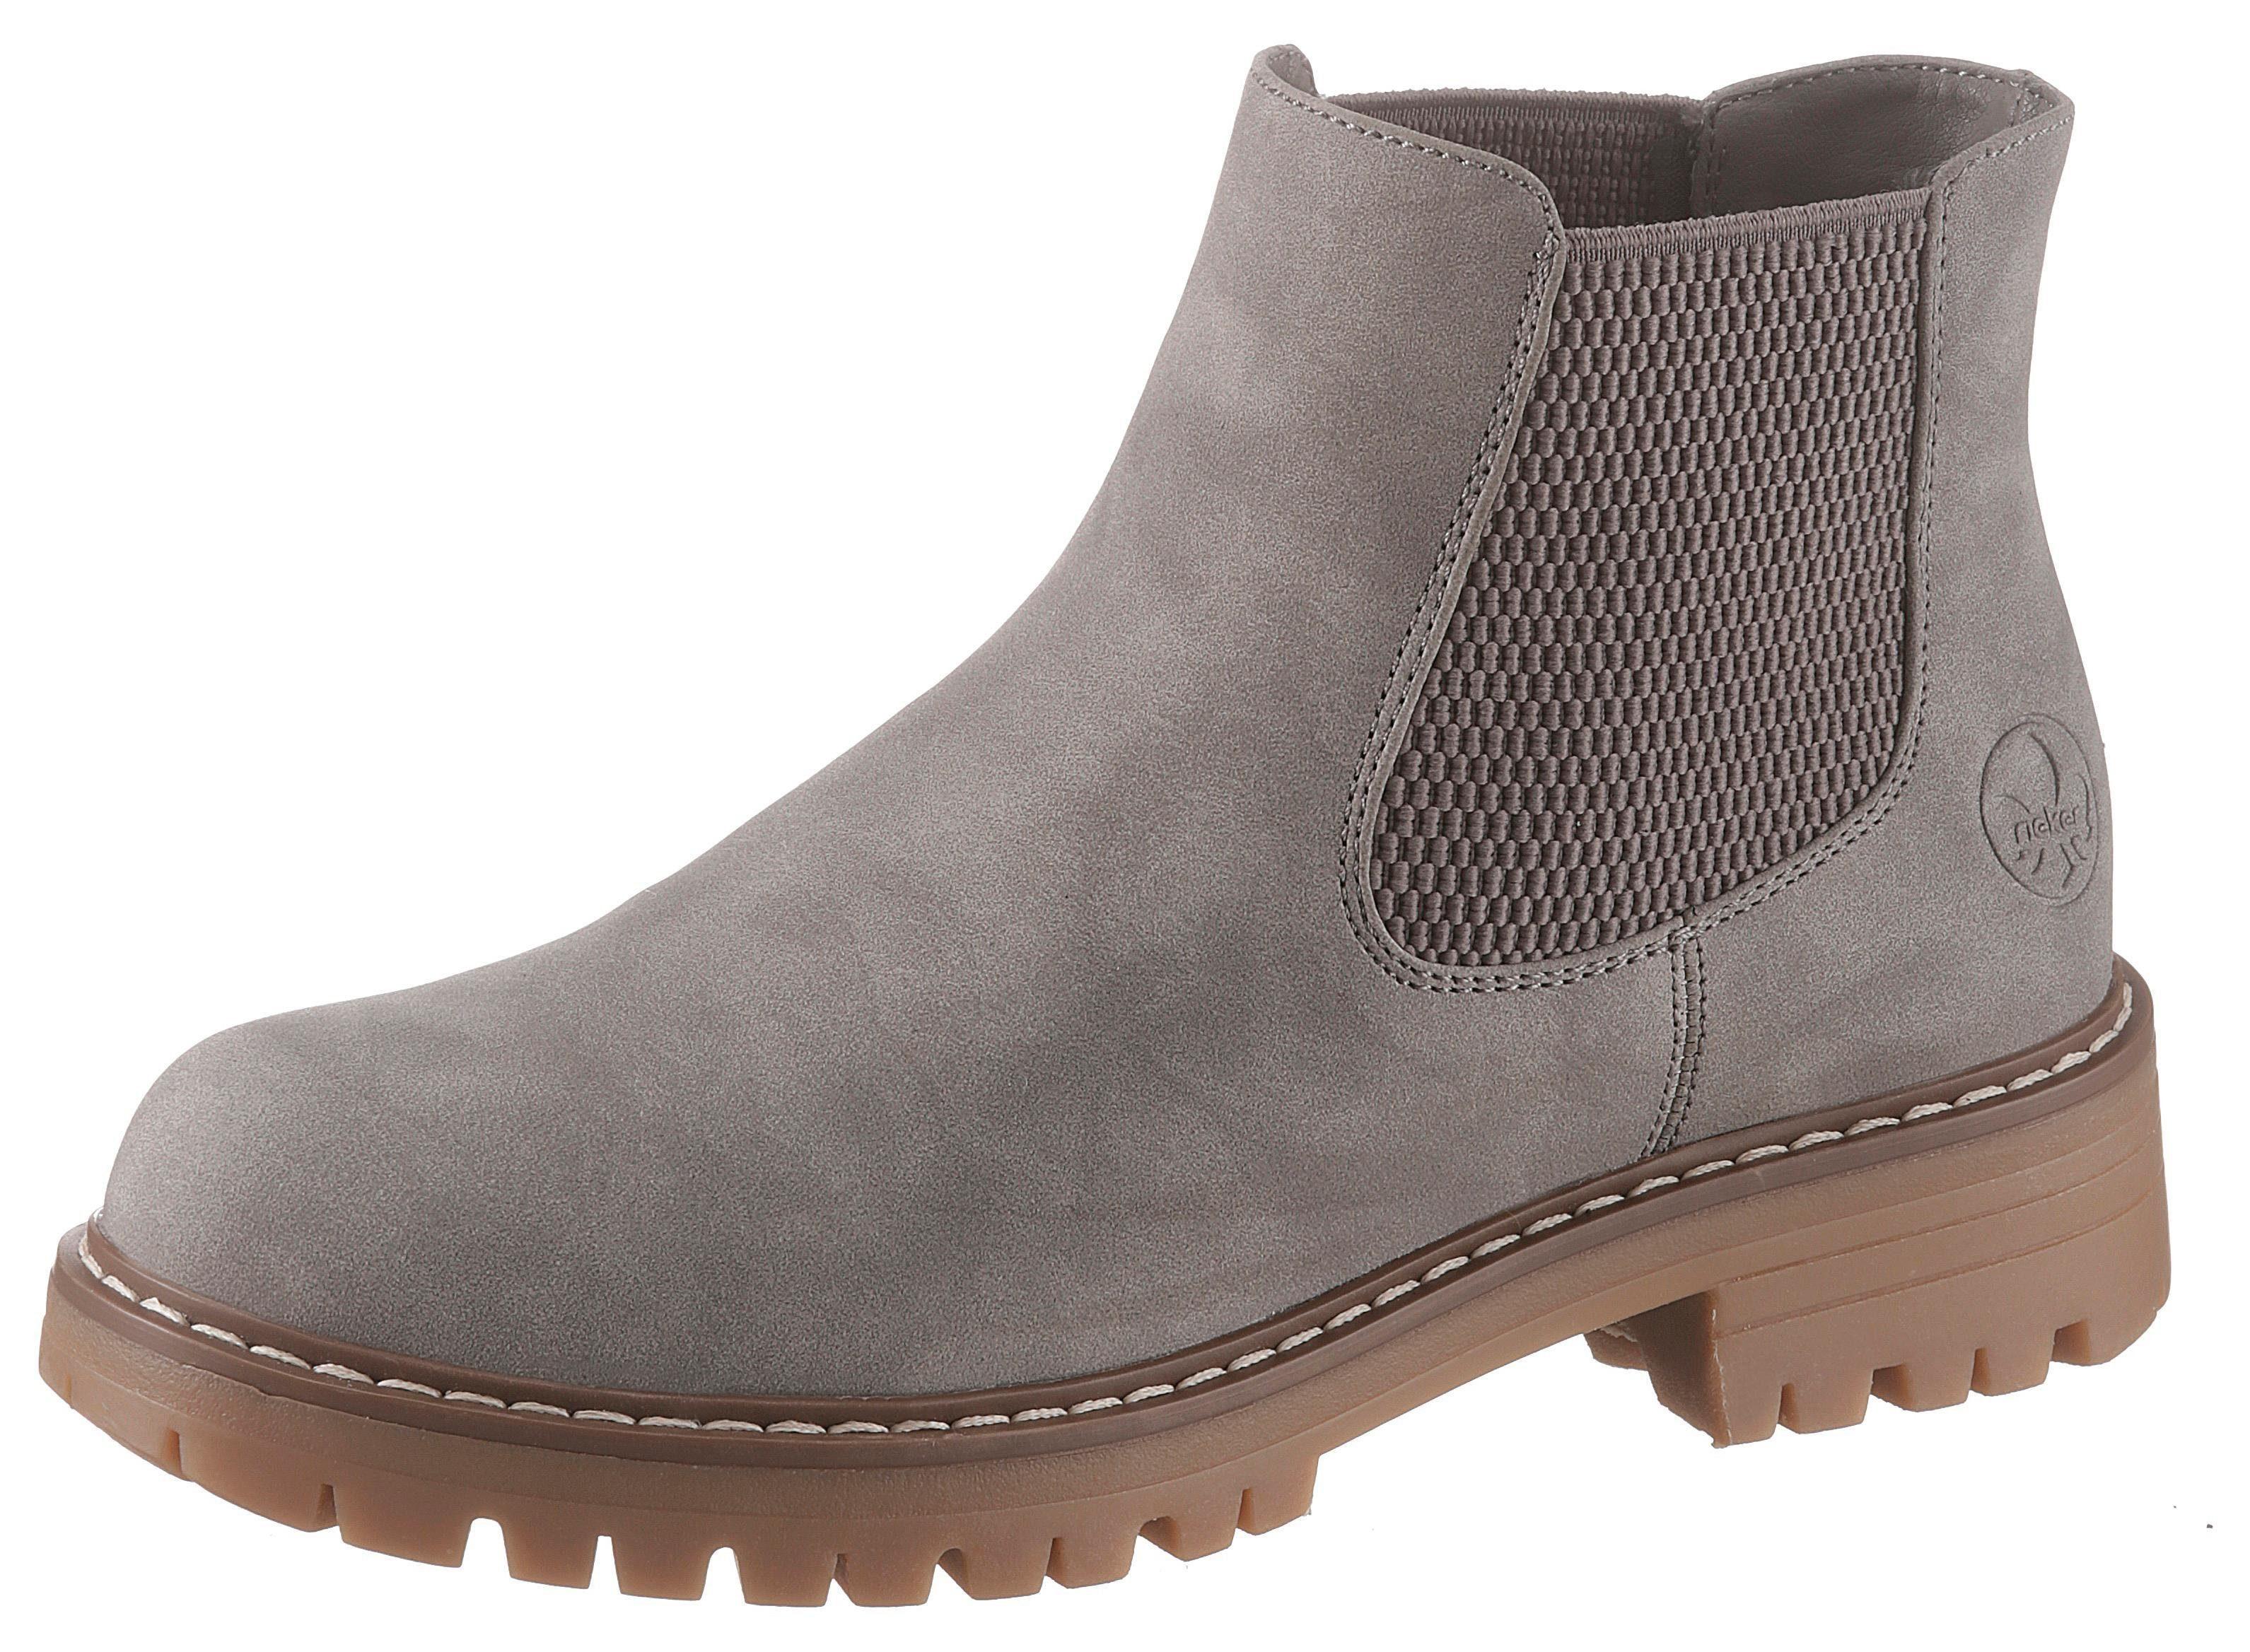 Rieker Chelsea Boots, Obermaterial: Textil online kaufen | OTTO